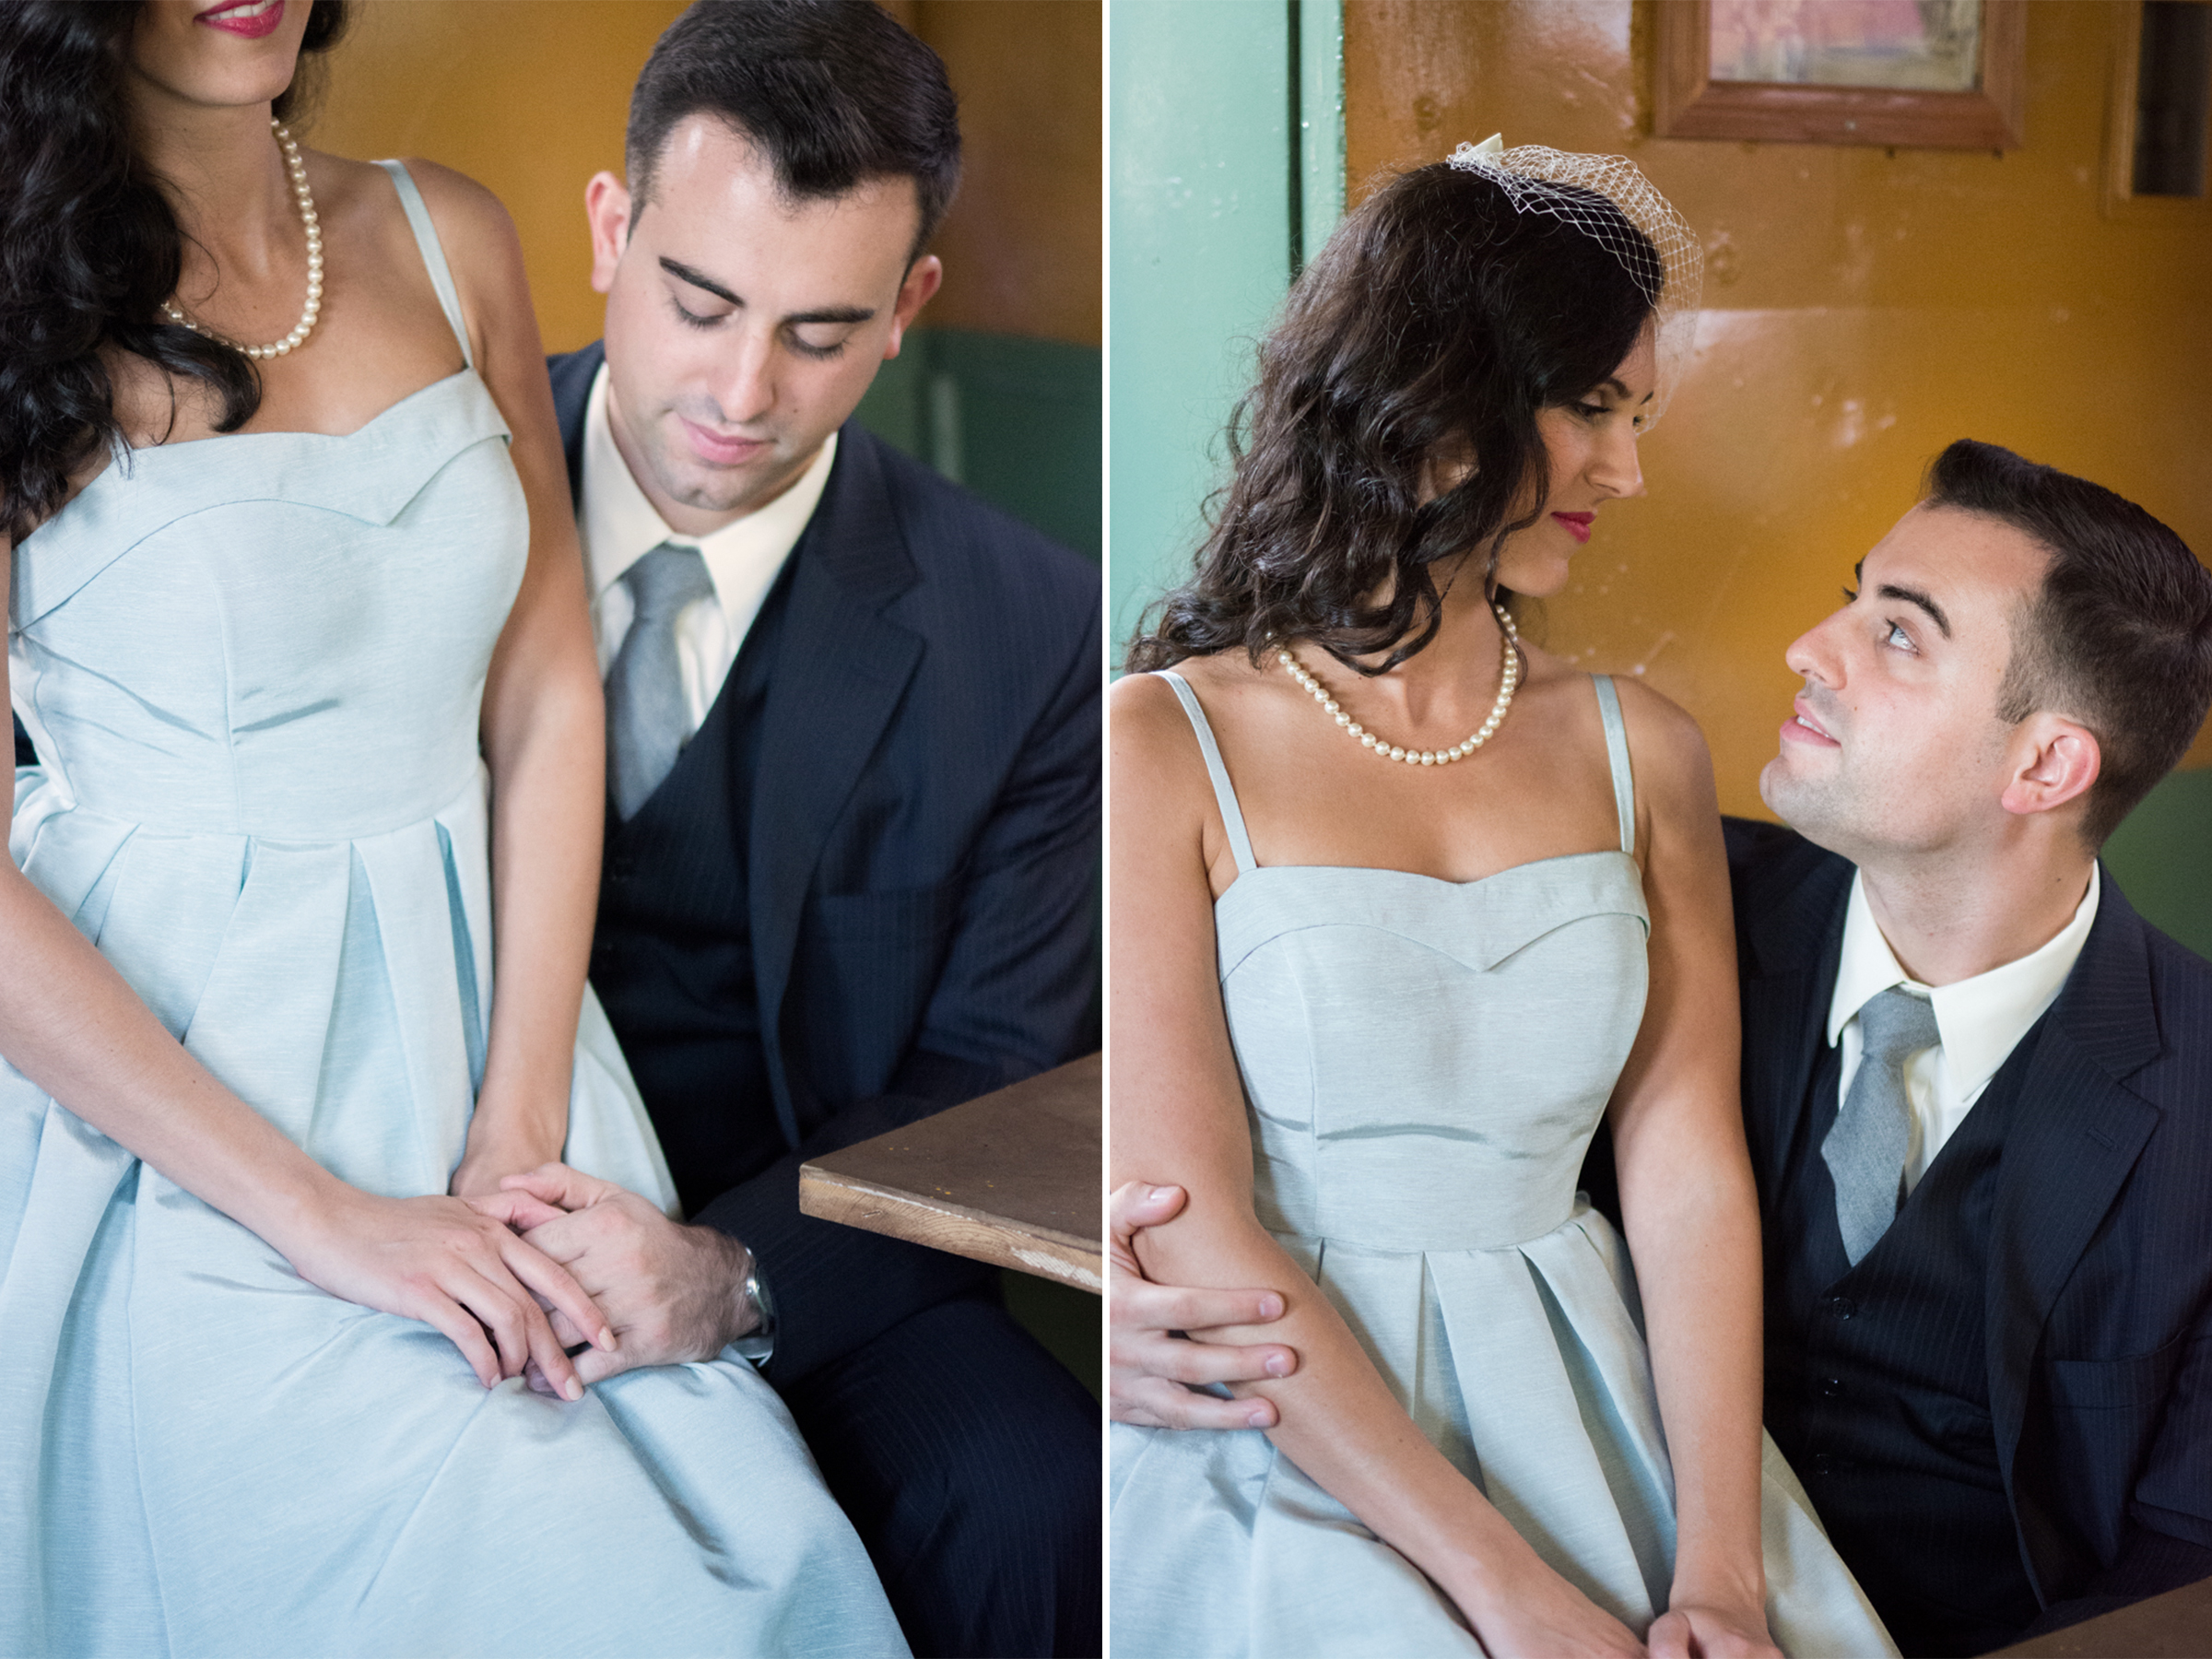 M+J Engagement Photos 6- Whippany Railway Museum- New Jersey -Olivia Christina Photography.jpg